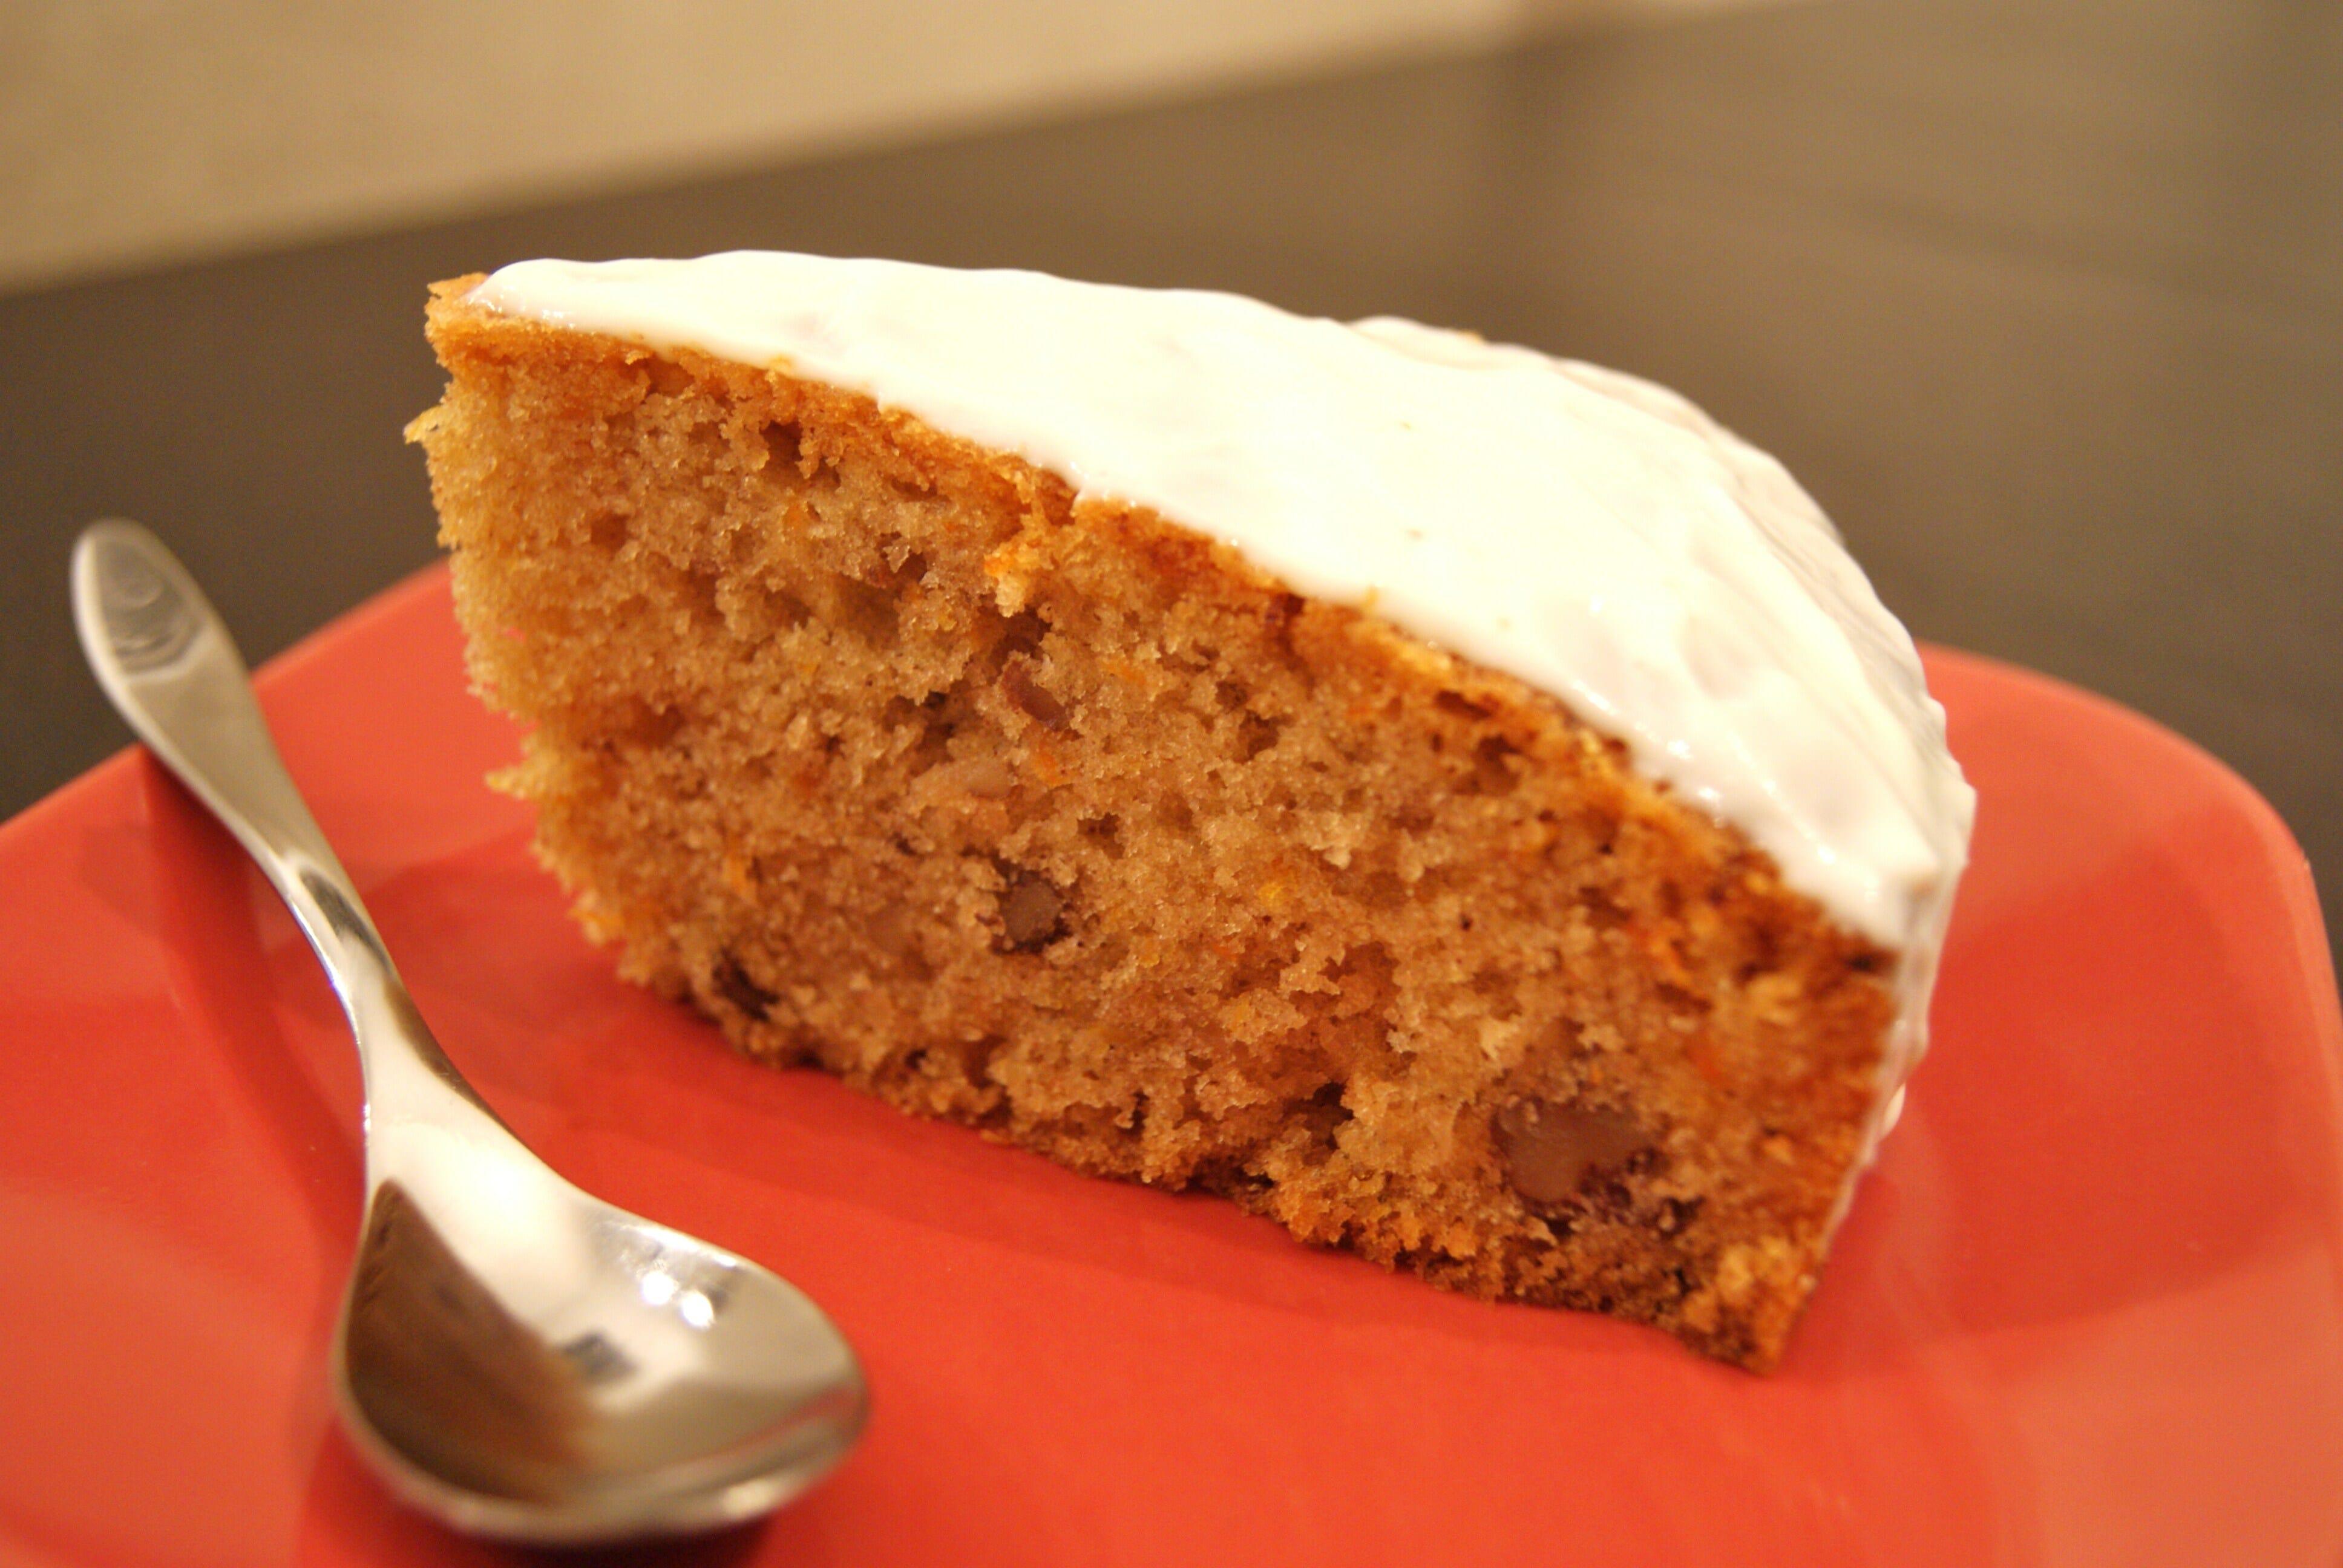 Lilie Bakery Carrot Cake